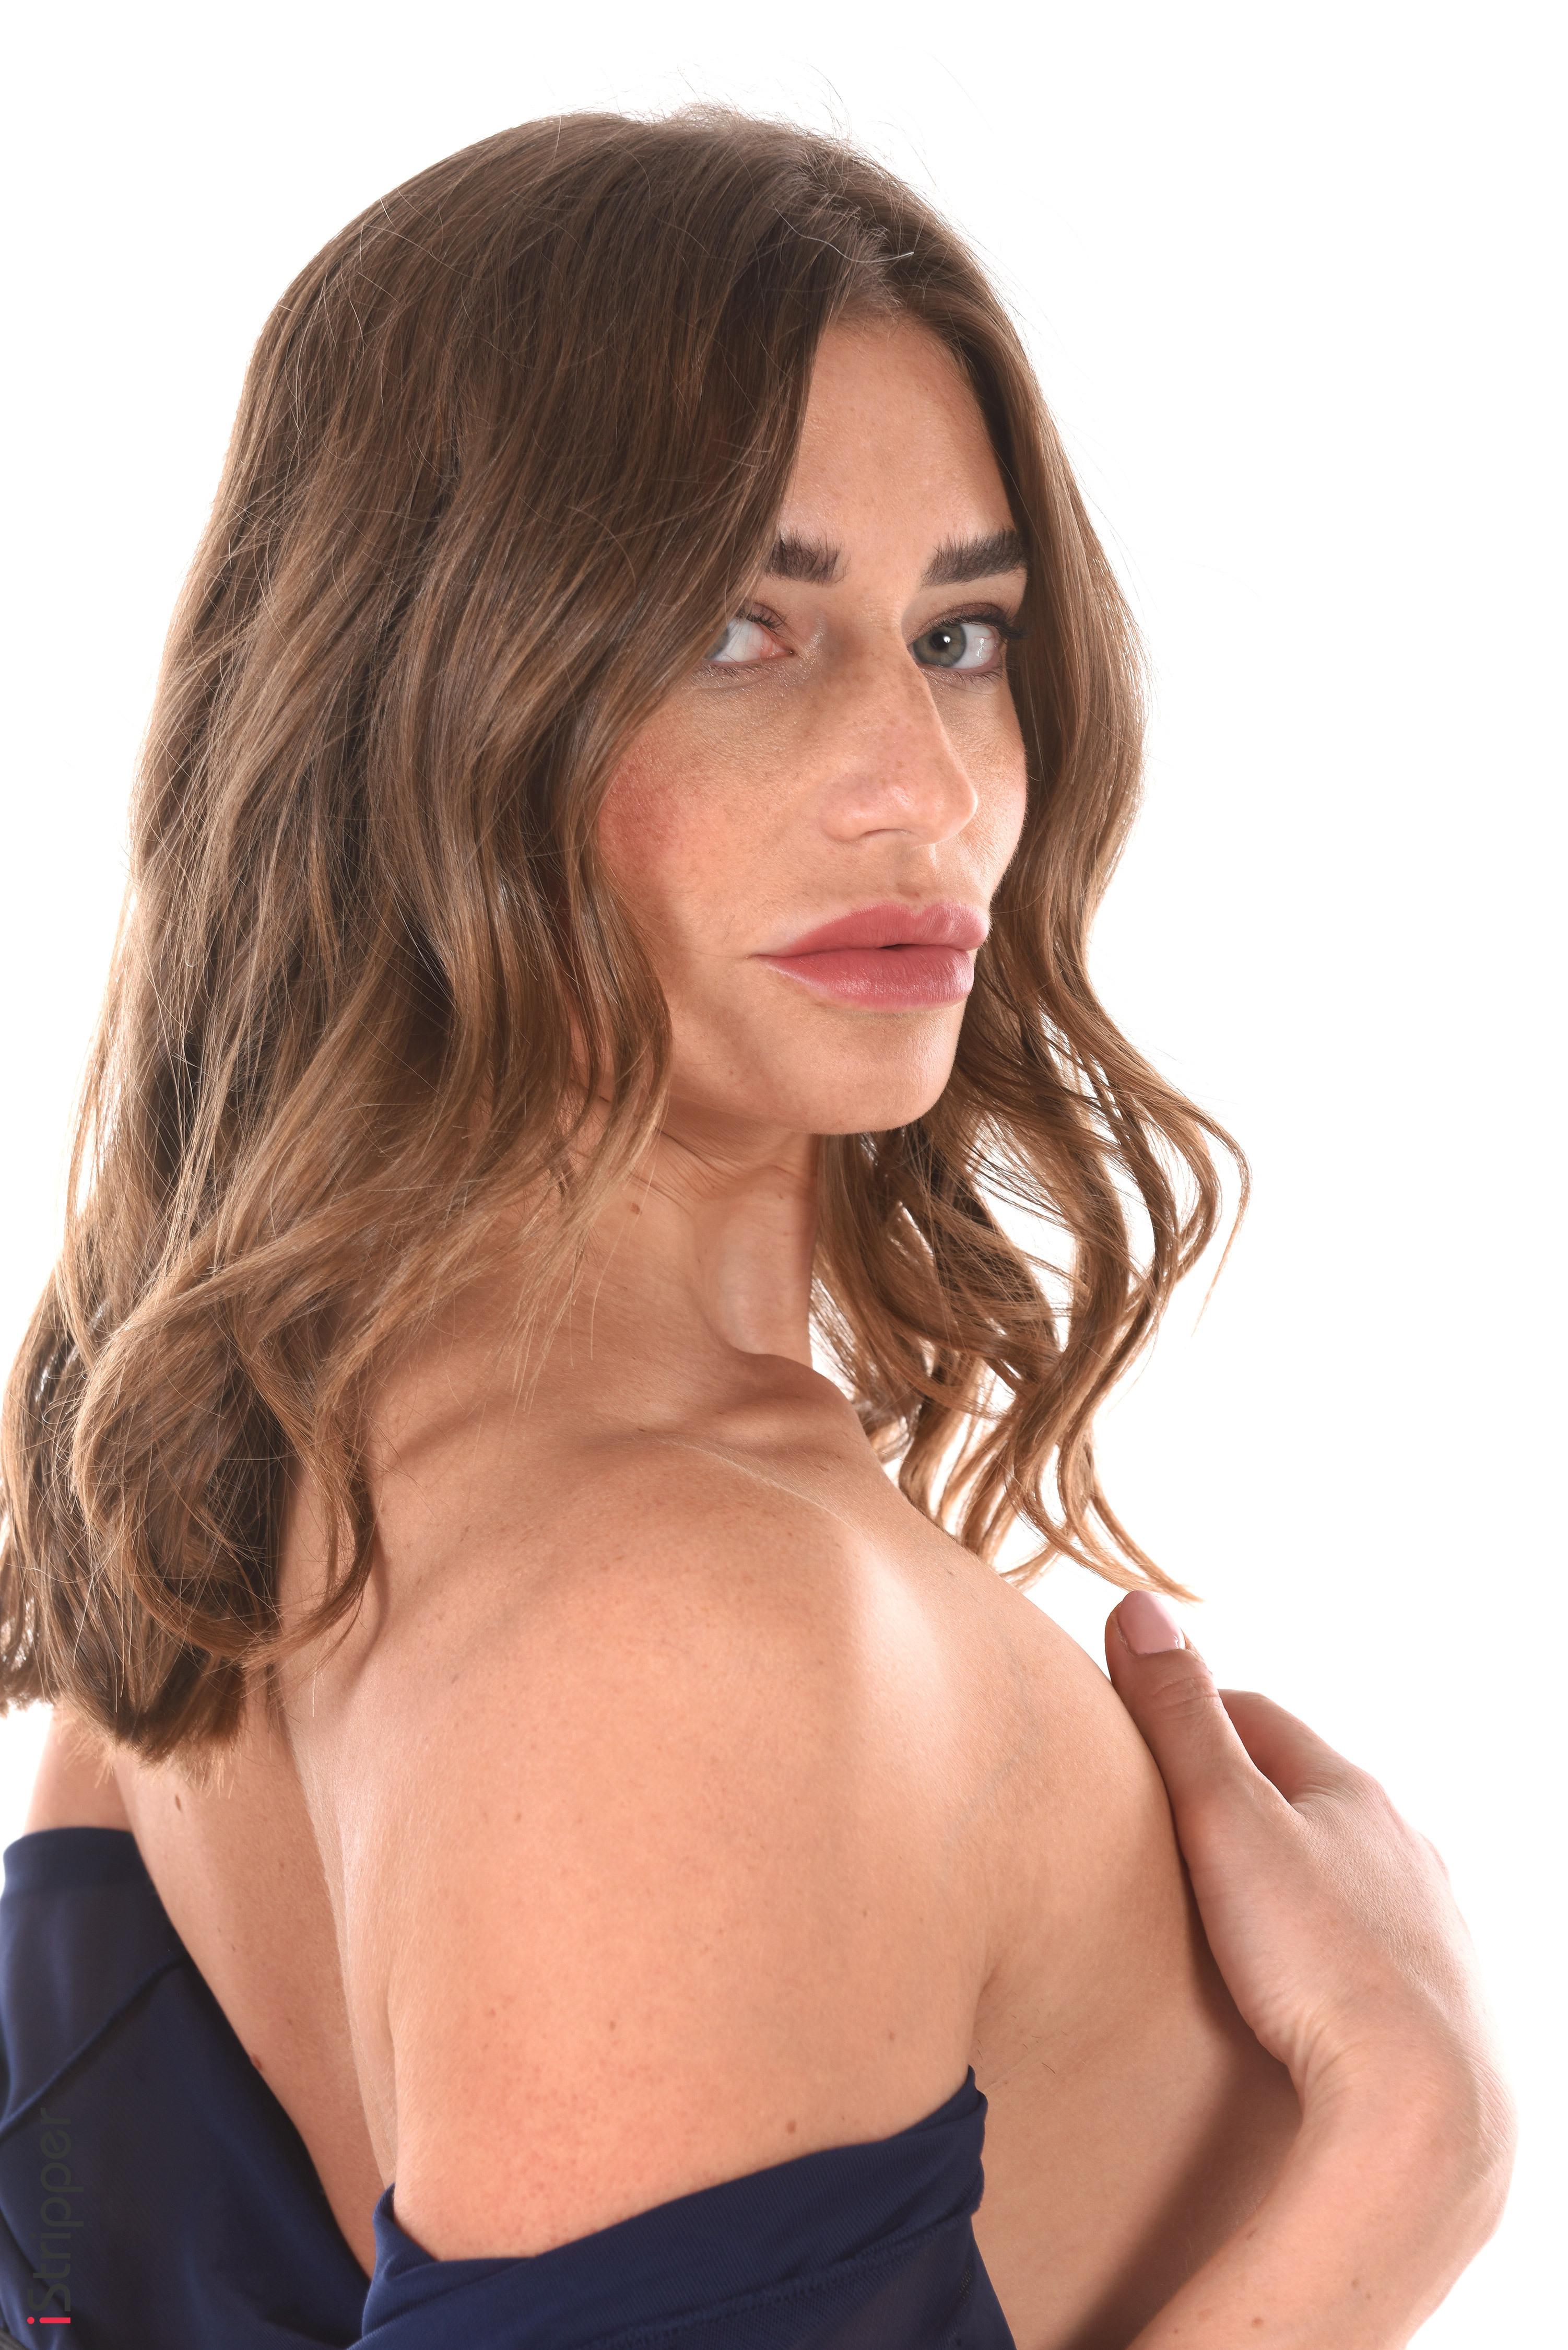 naked girl backrounds